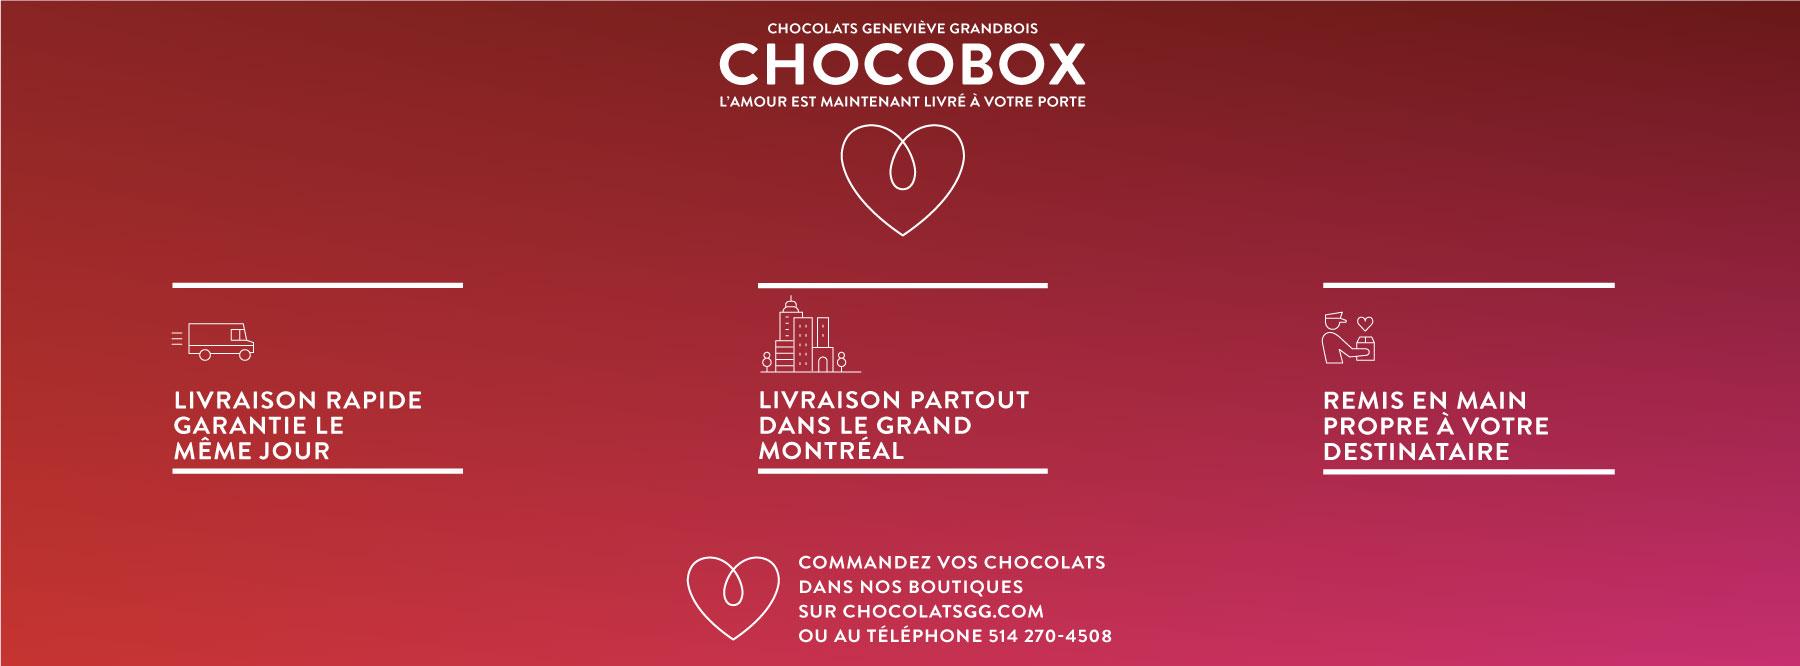 Service de livraison Chocobox Chocolats GG - Saint-Valentin